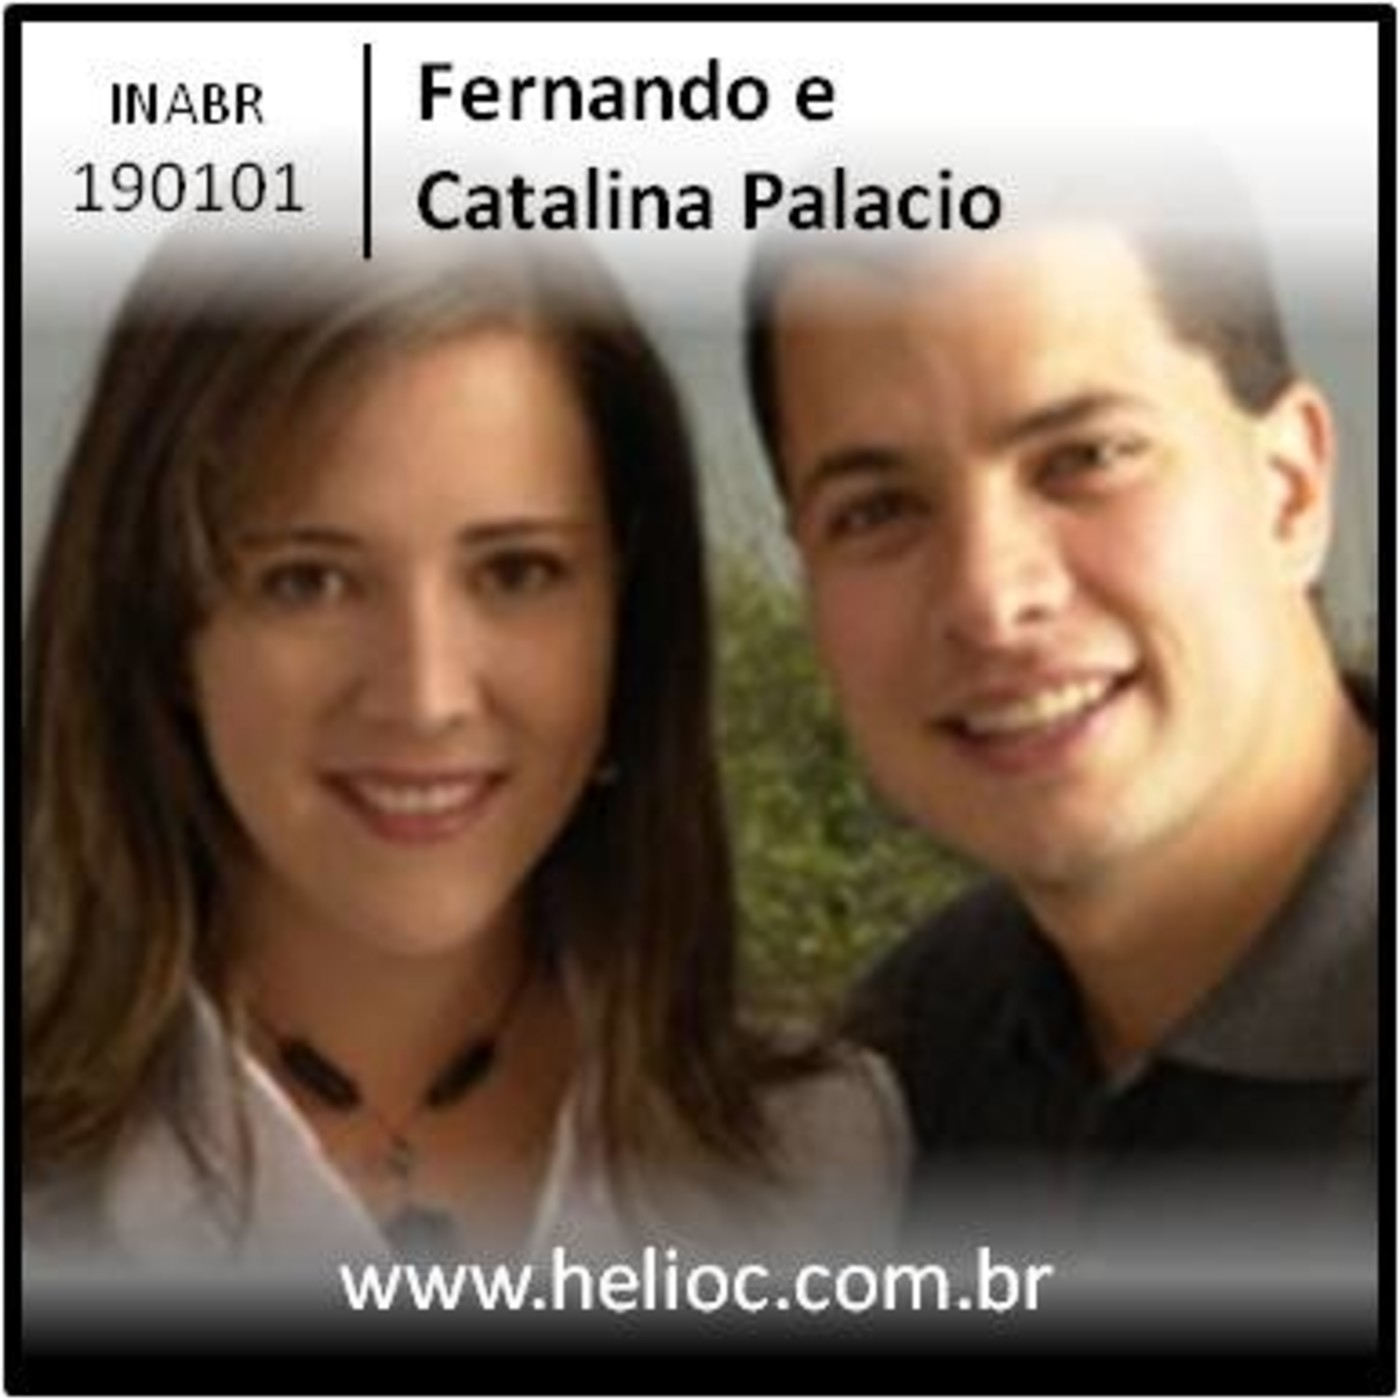 INABR 190101 - Como Construir Seu Proprio Negocio - Fernando e Catalina Palacio